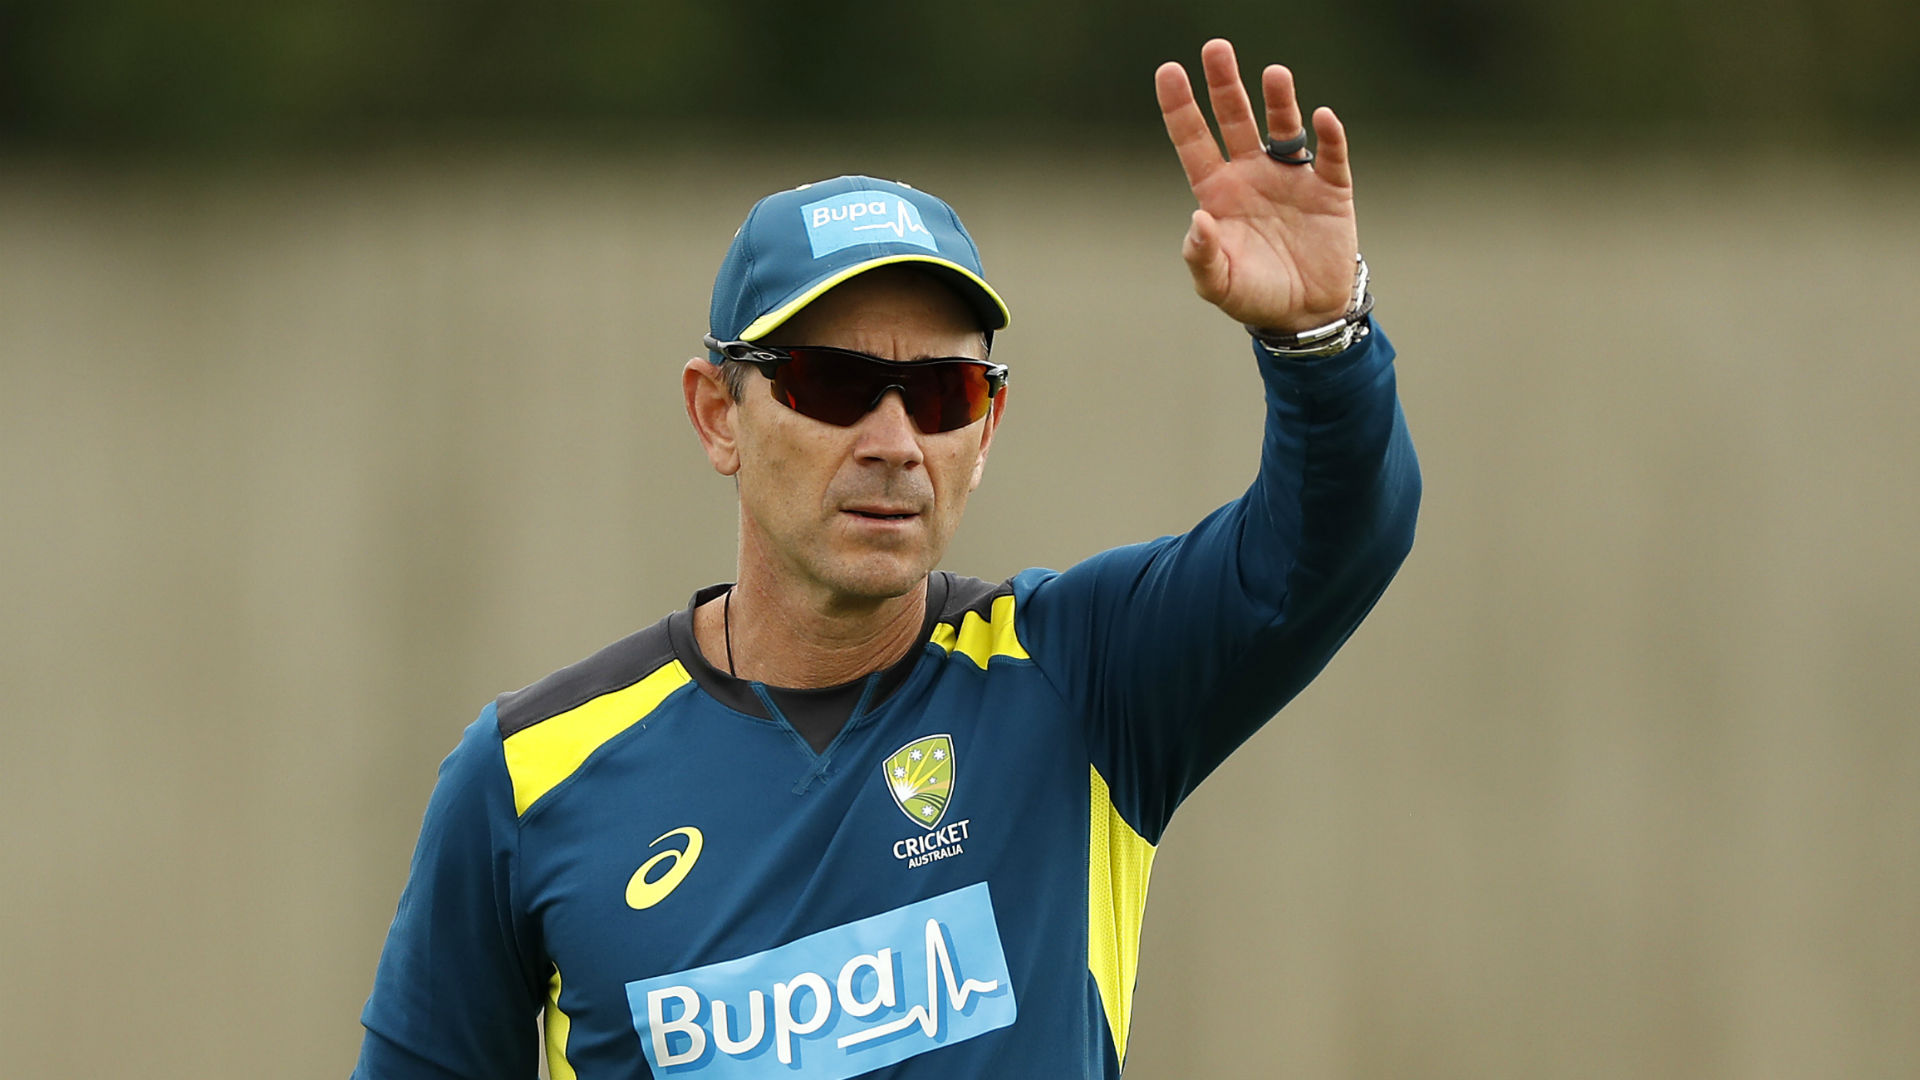 Coronavirus: Australia coach Langer sees merit in games behind closed doors